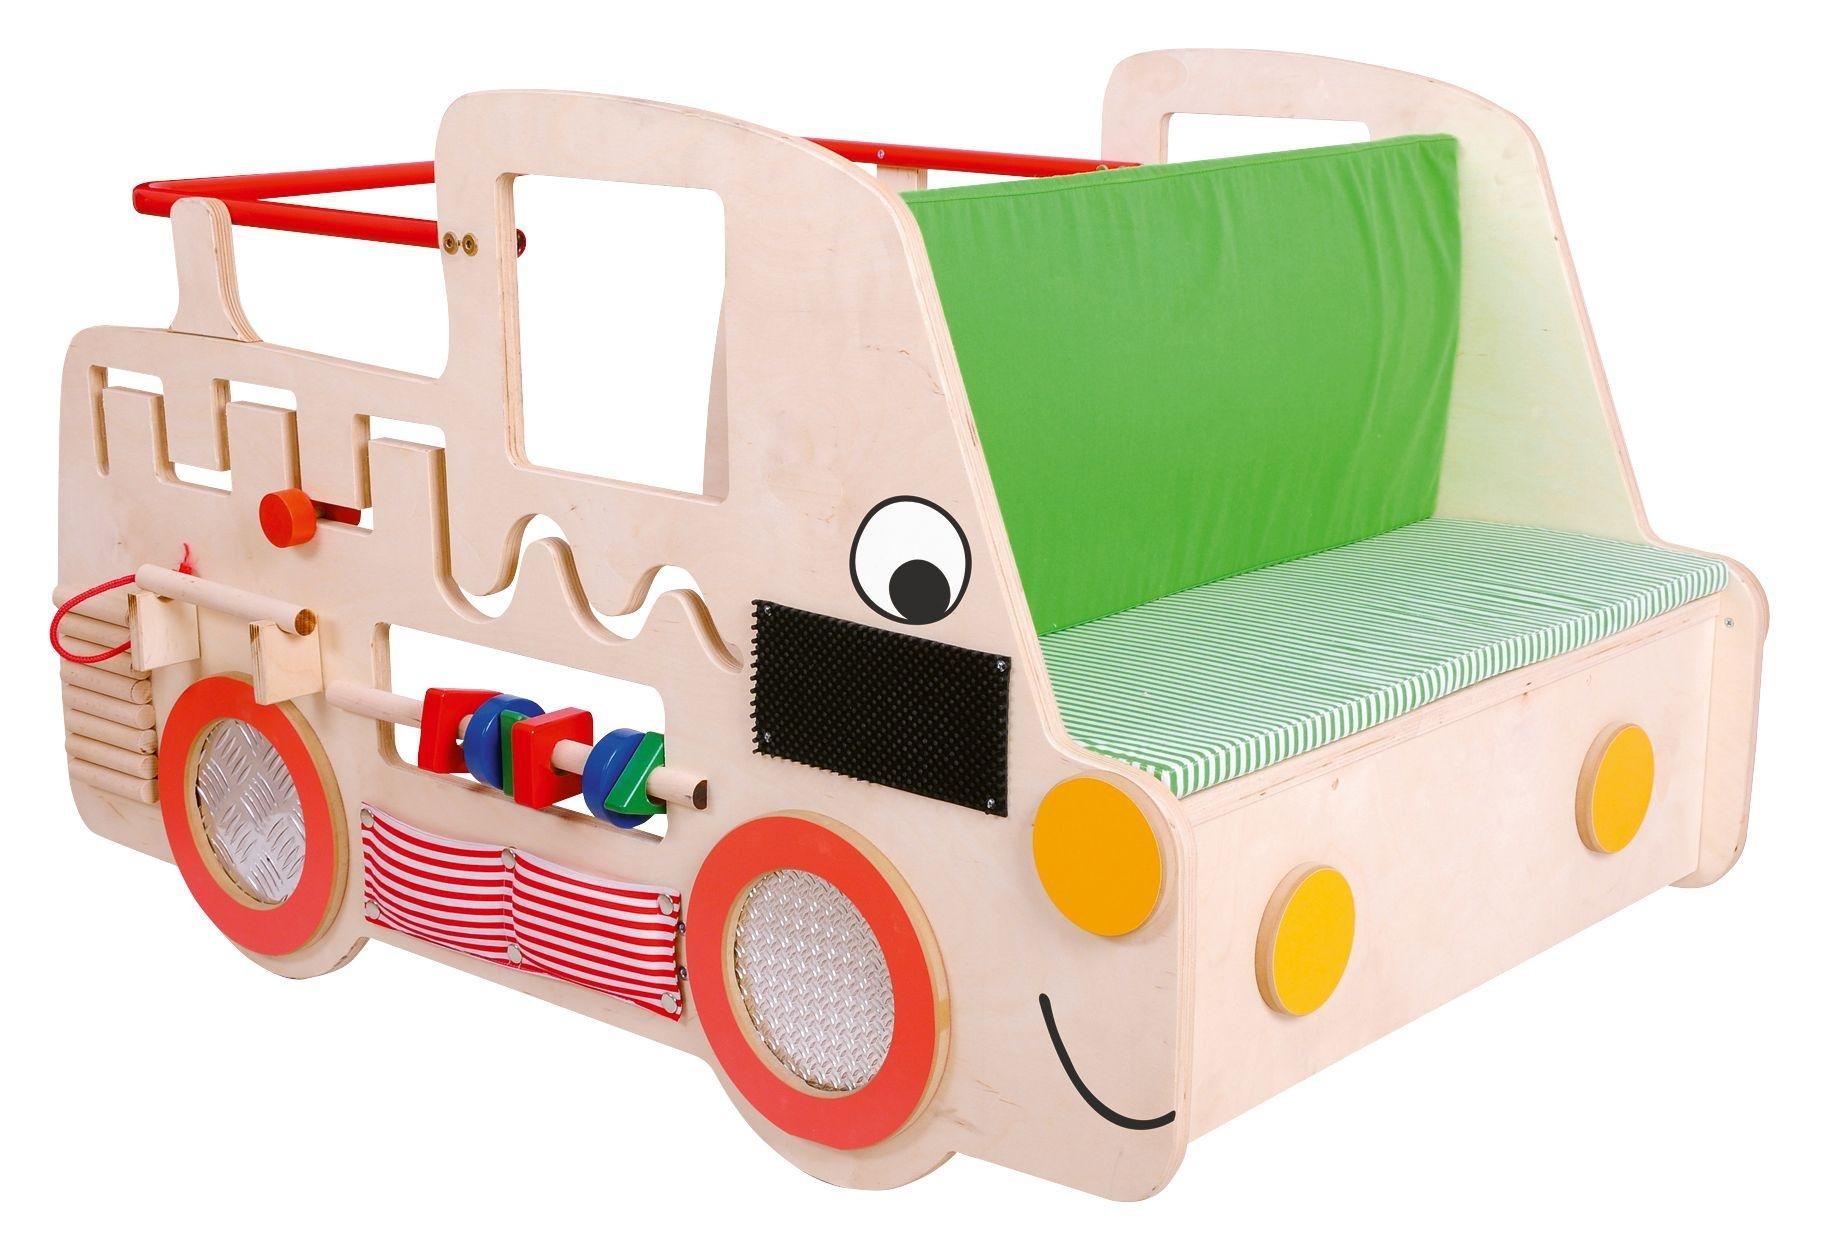 Image of Car Sensory Activity Play Centre.